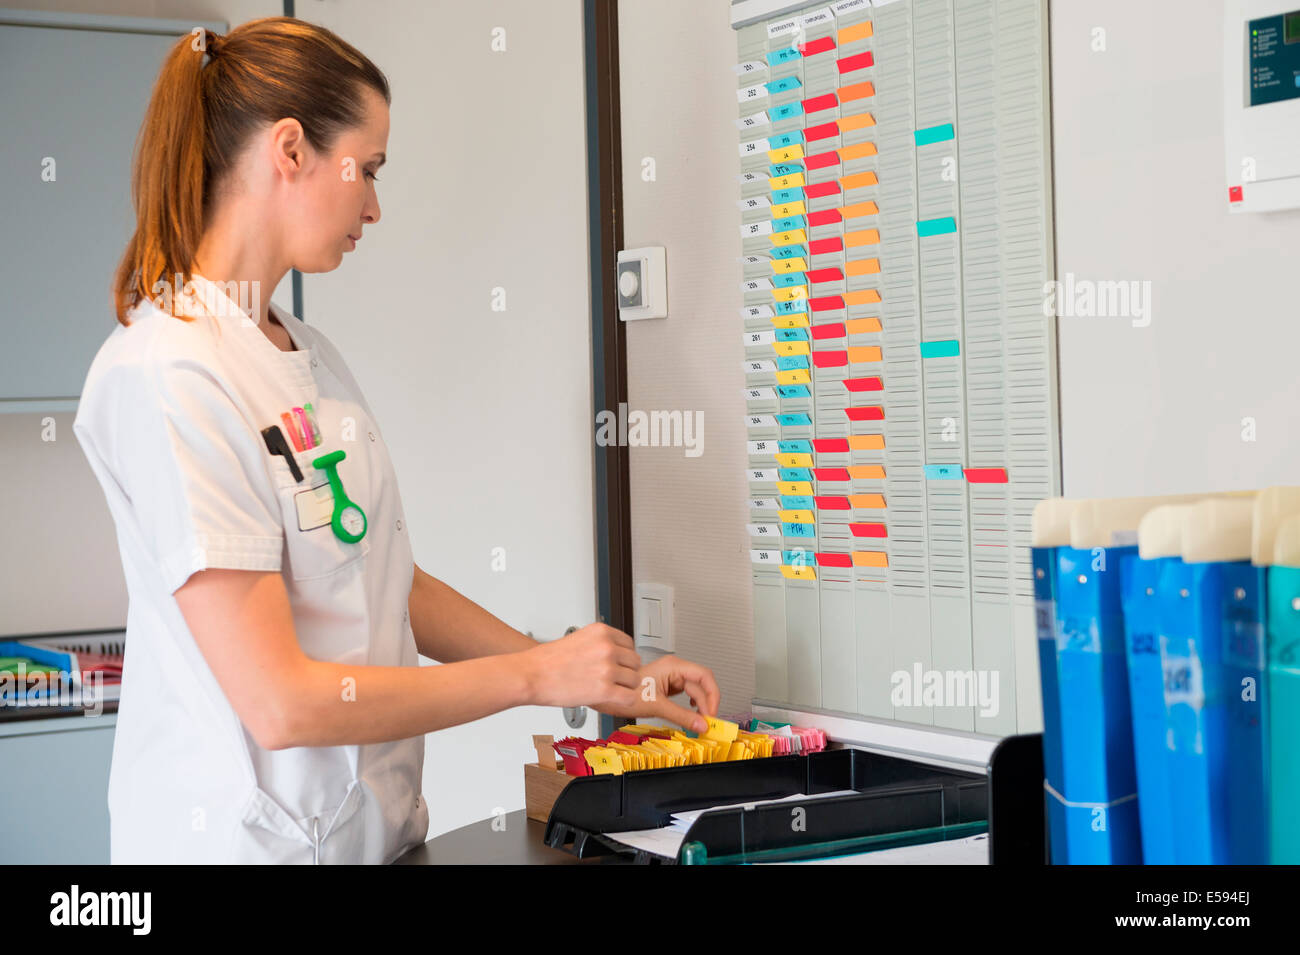 Female nurse arranging schedule in hospital - Stock Image